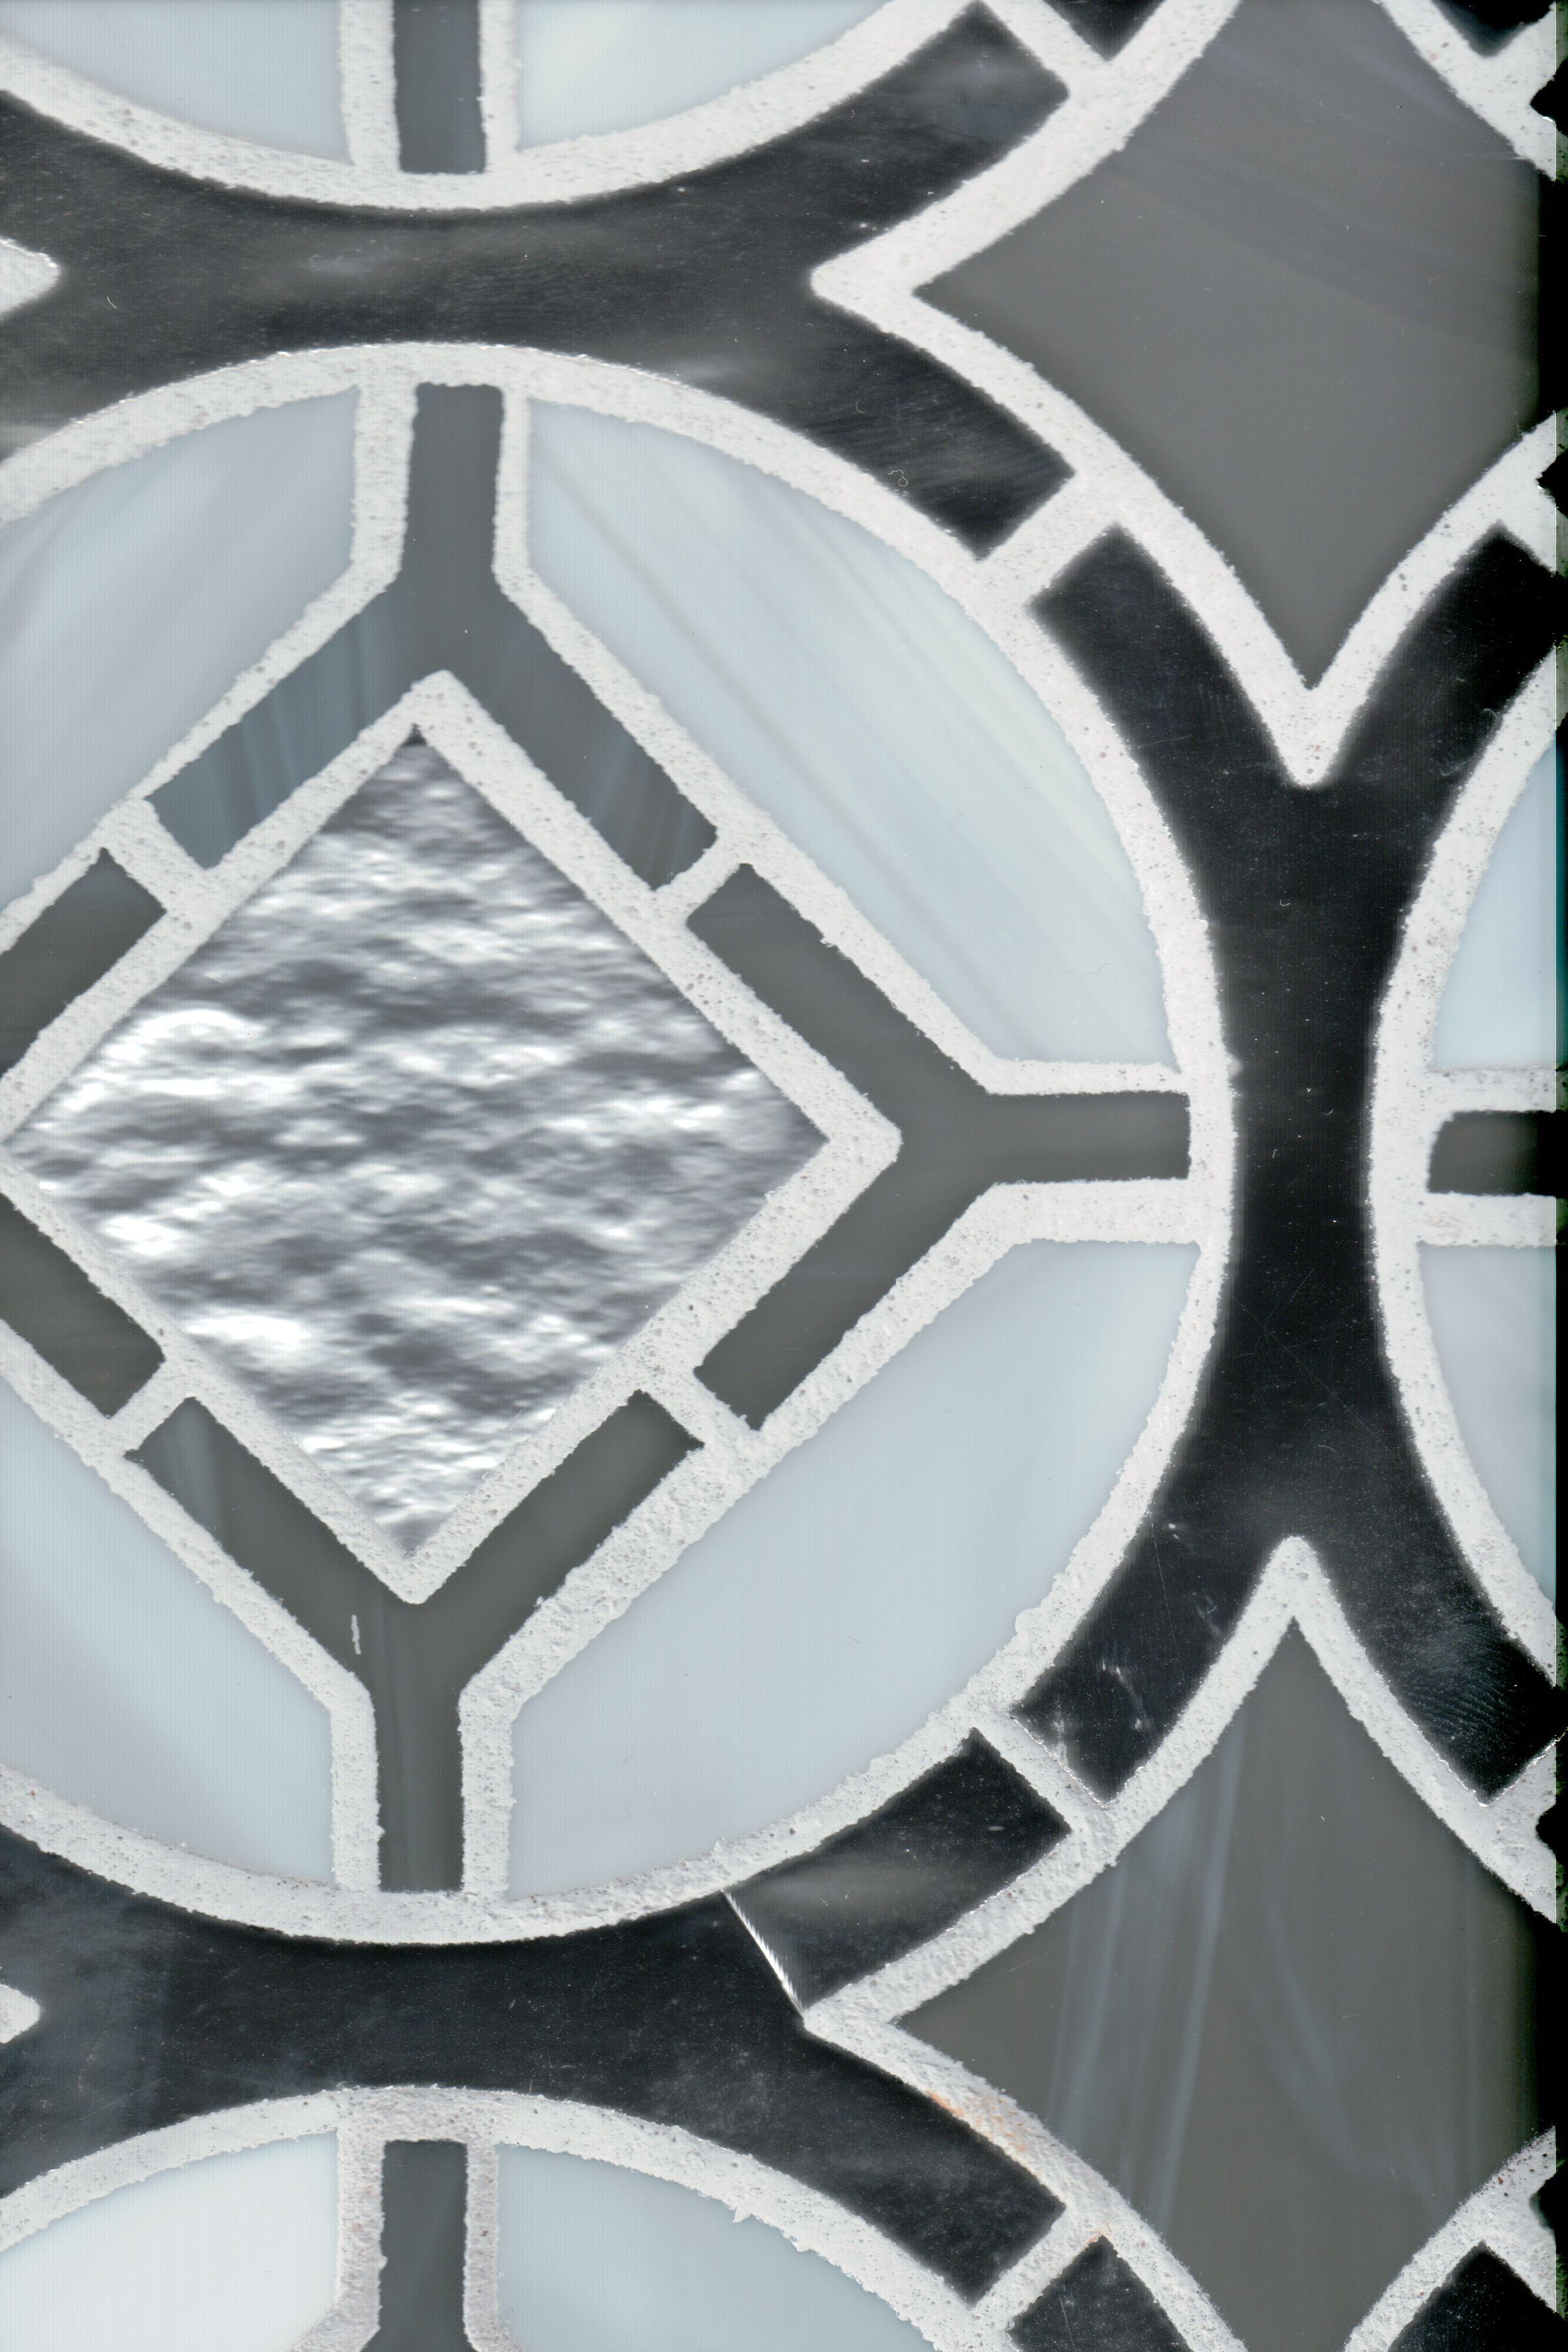 Devotion Glass Tile - Cathedral Pattern - Stunning statement tile ...